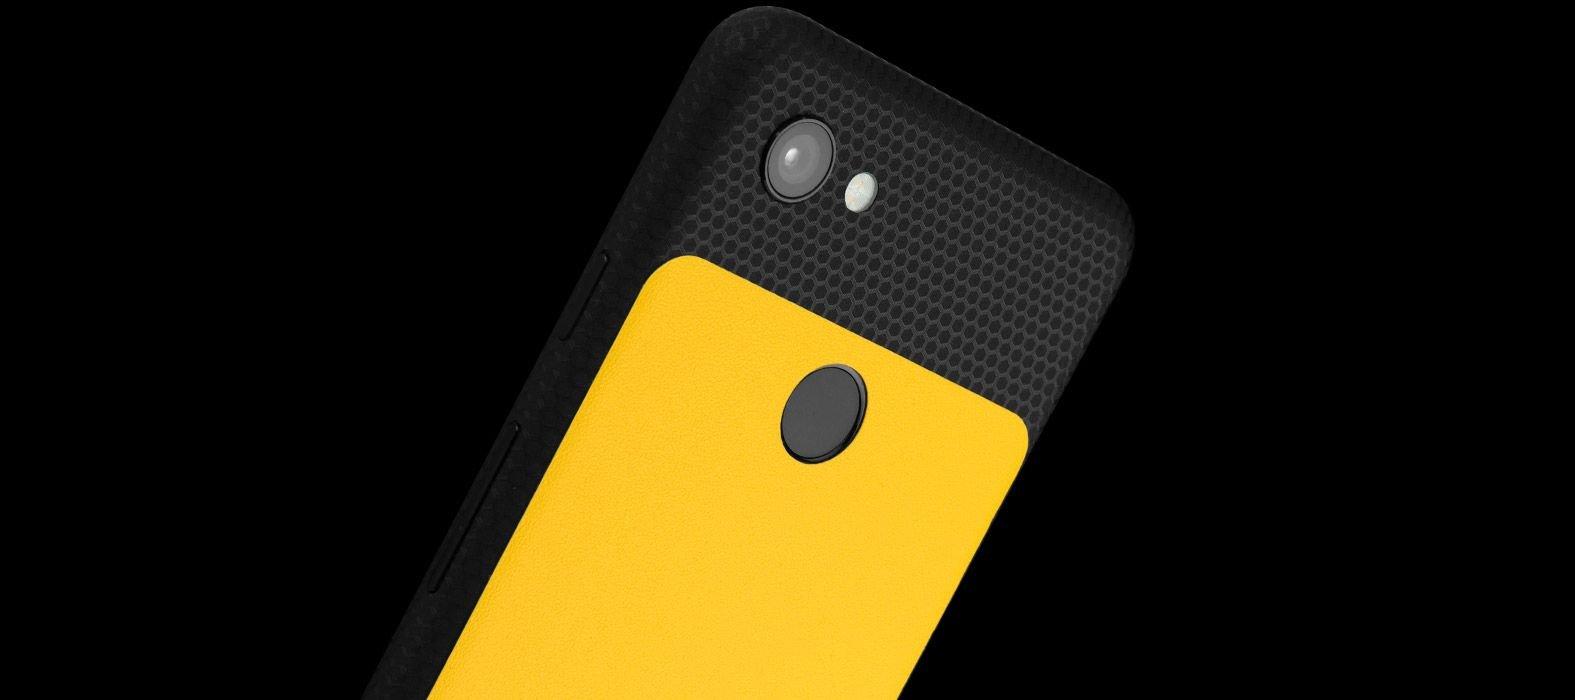 Pixel-3A_Black-Matrix-With-Yellow_Sandstone_skins